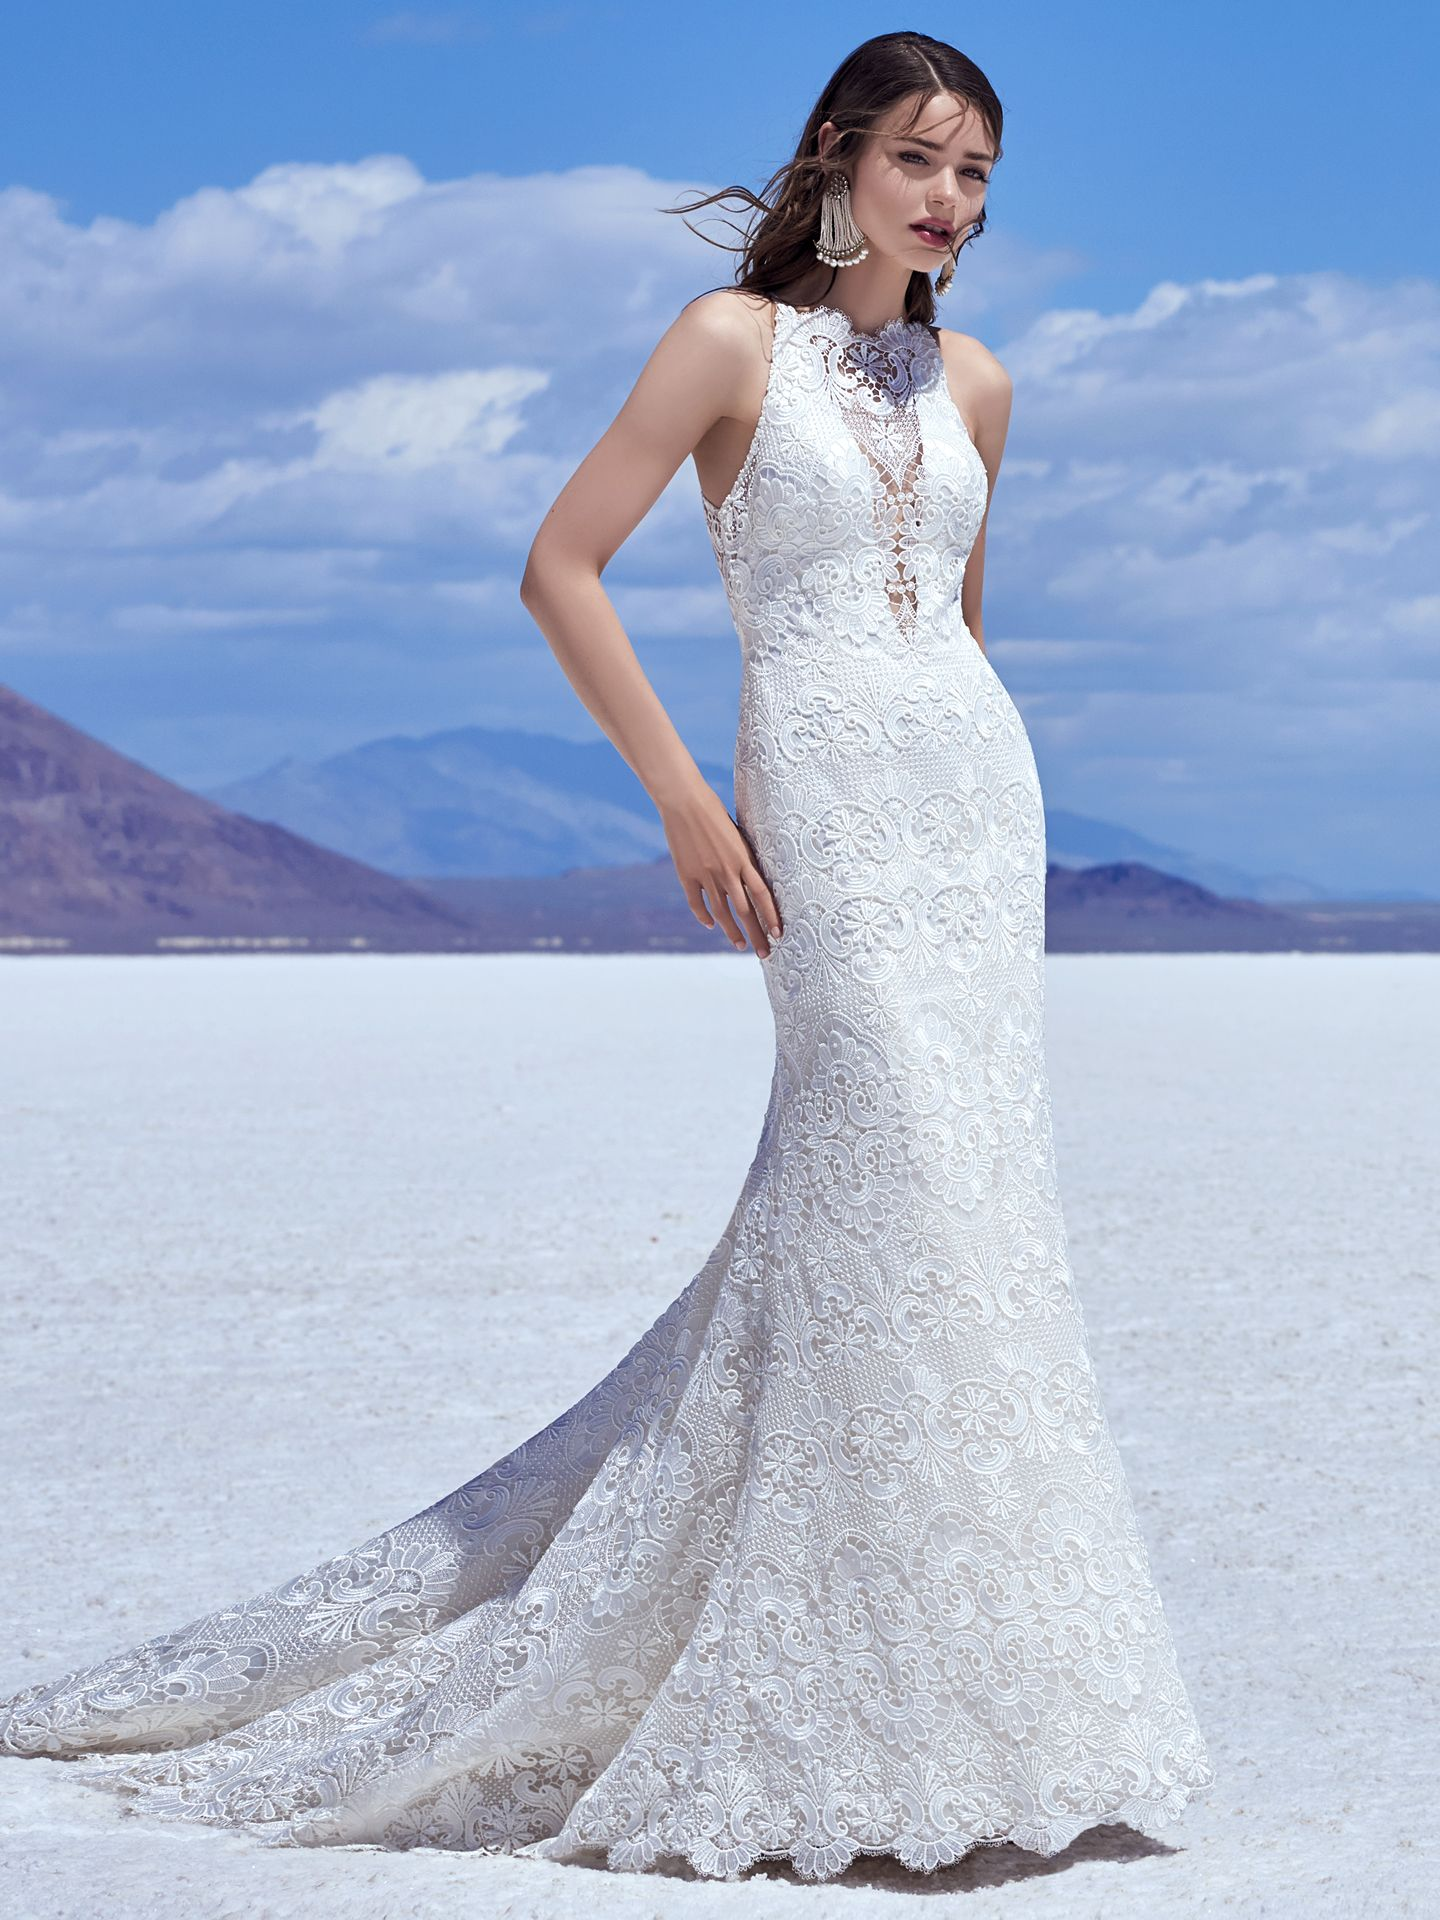 Satin wedding dress Zayn by Sottero and Midgley